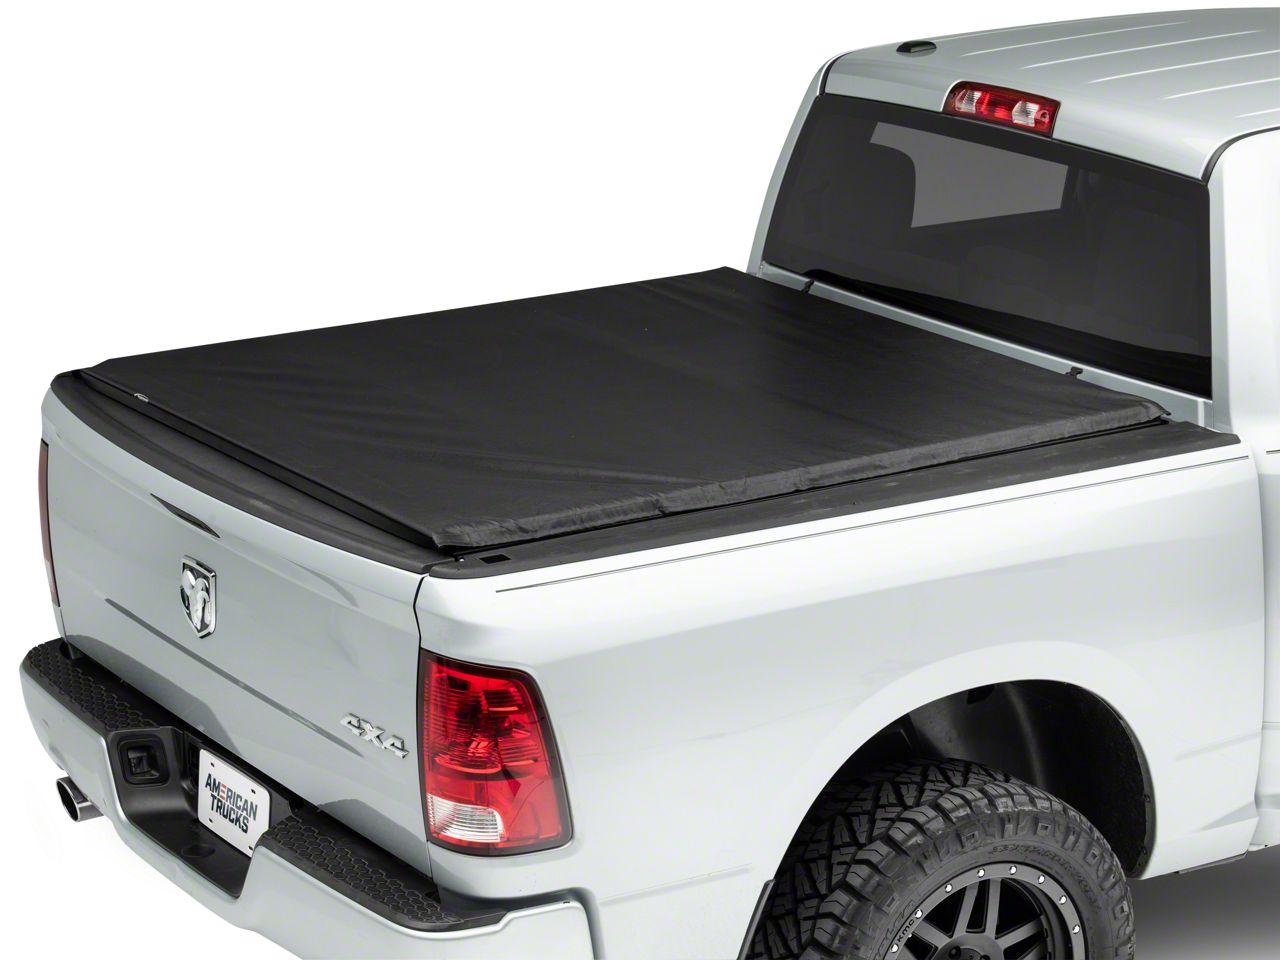 Access TonnoSport Roll-Up Tonneau Cover (09-18 RAM 1500 w/ 5.7 ft. Box & w/o RAM Box)